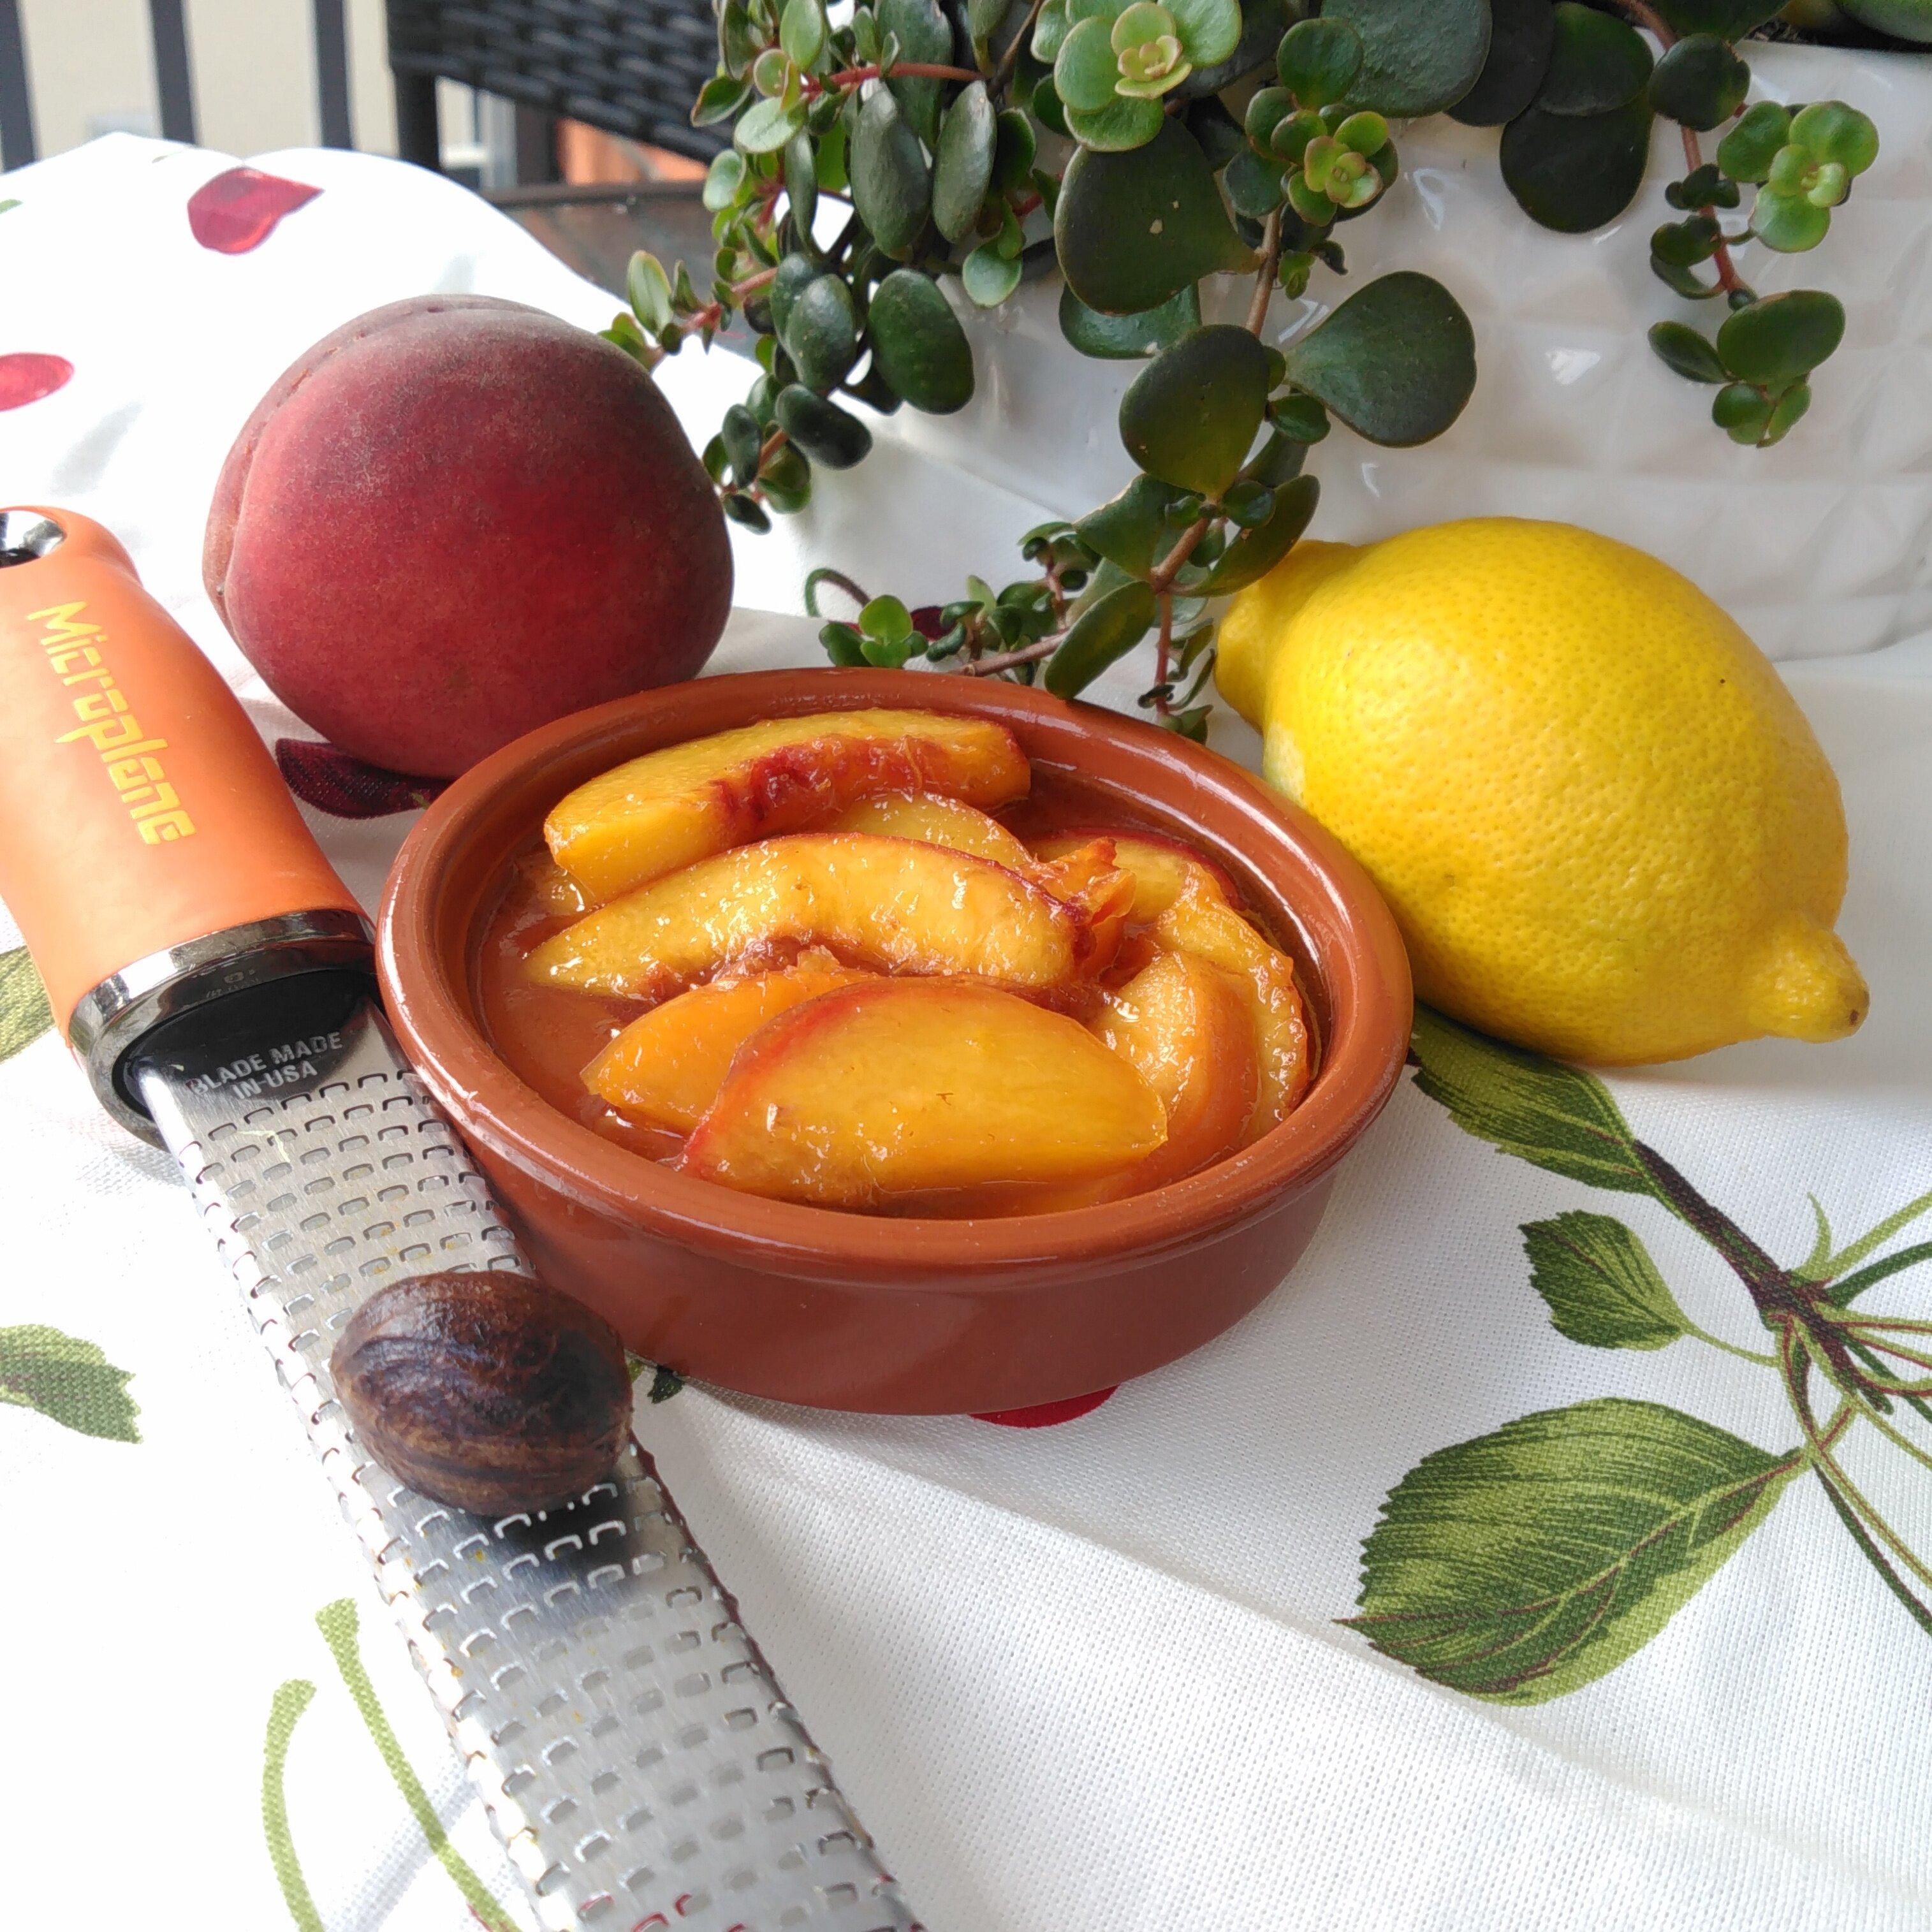 maple peach ice cream topping